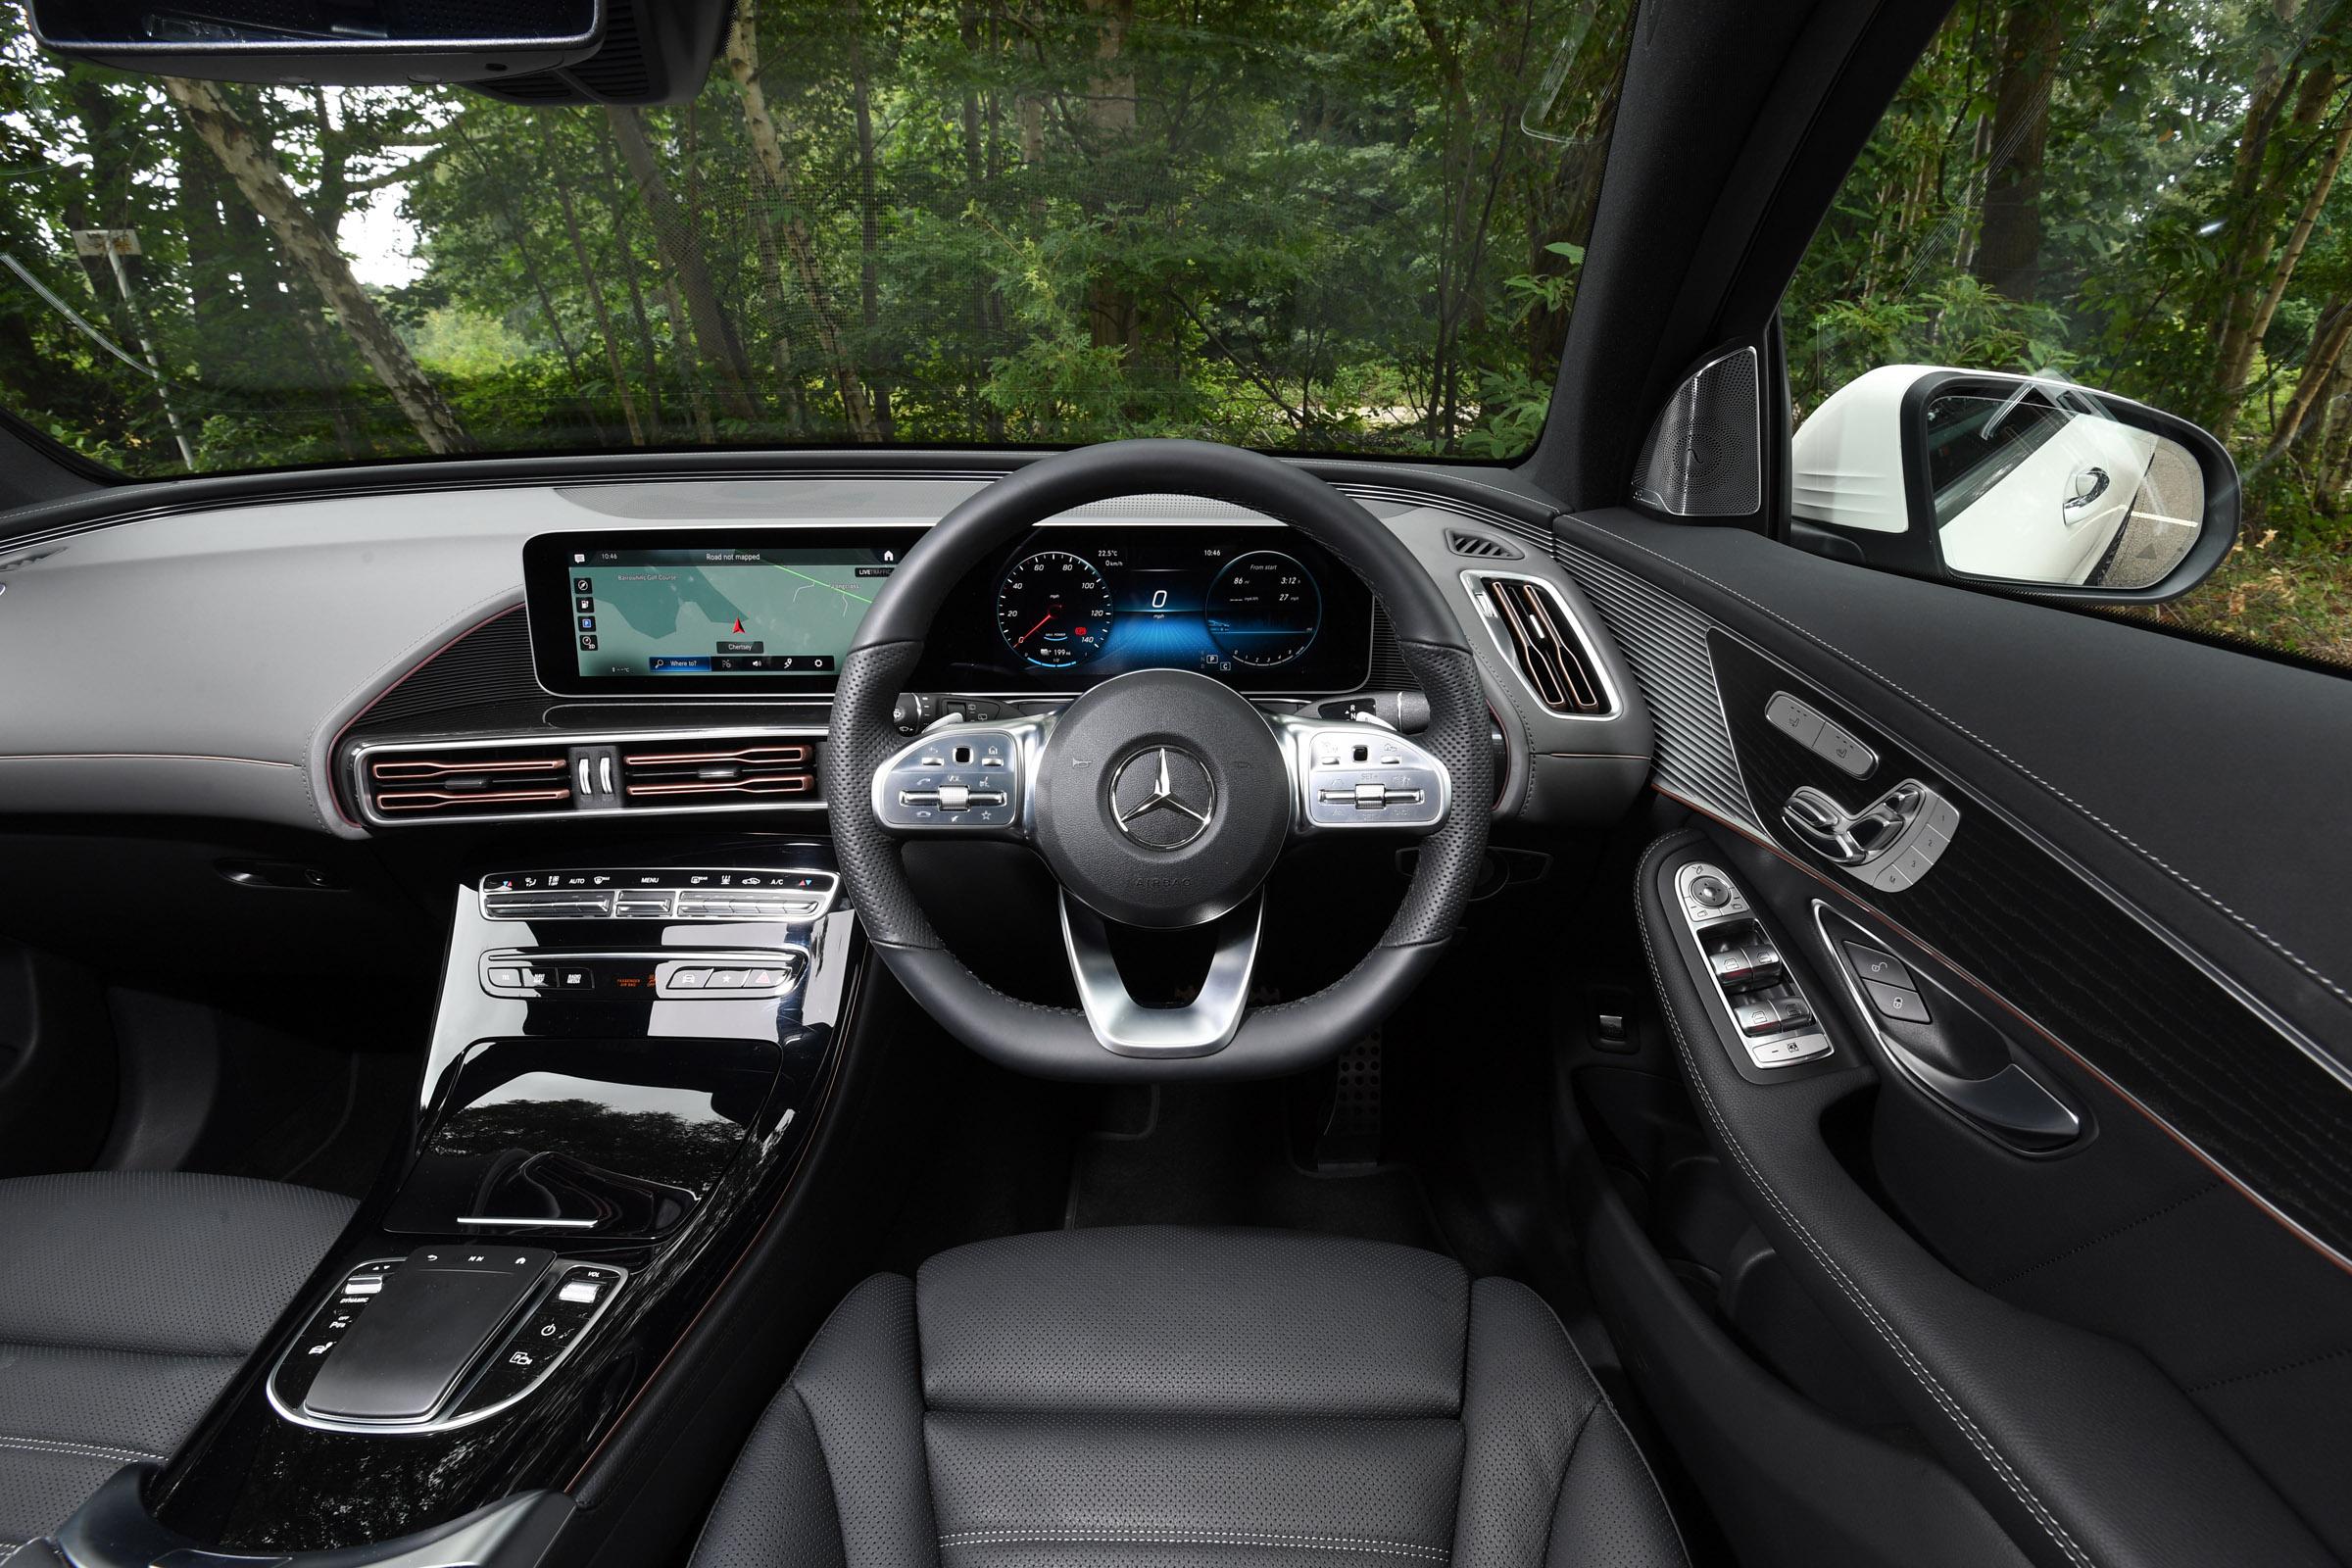 Mercedes EQC interior & comfort | DrivingElectric